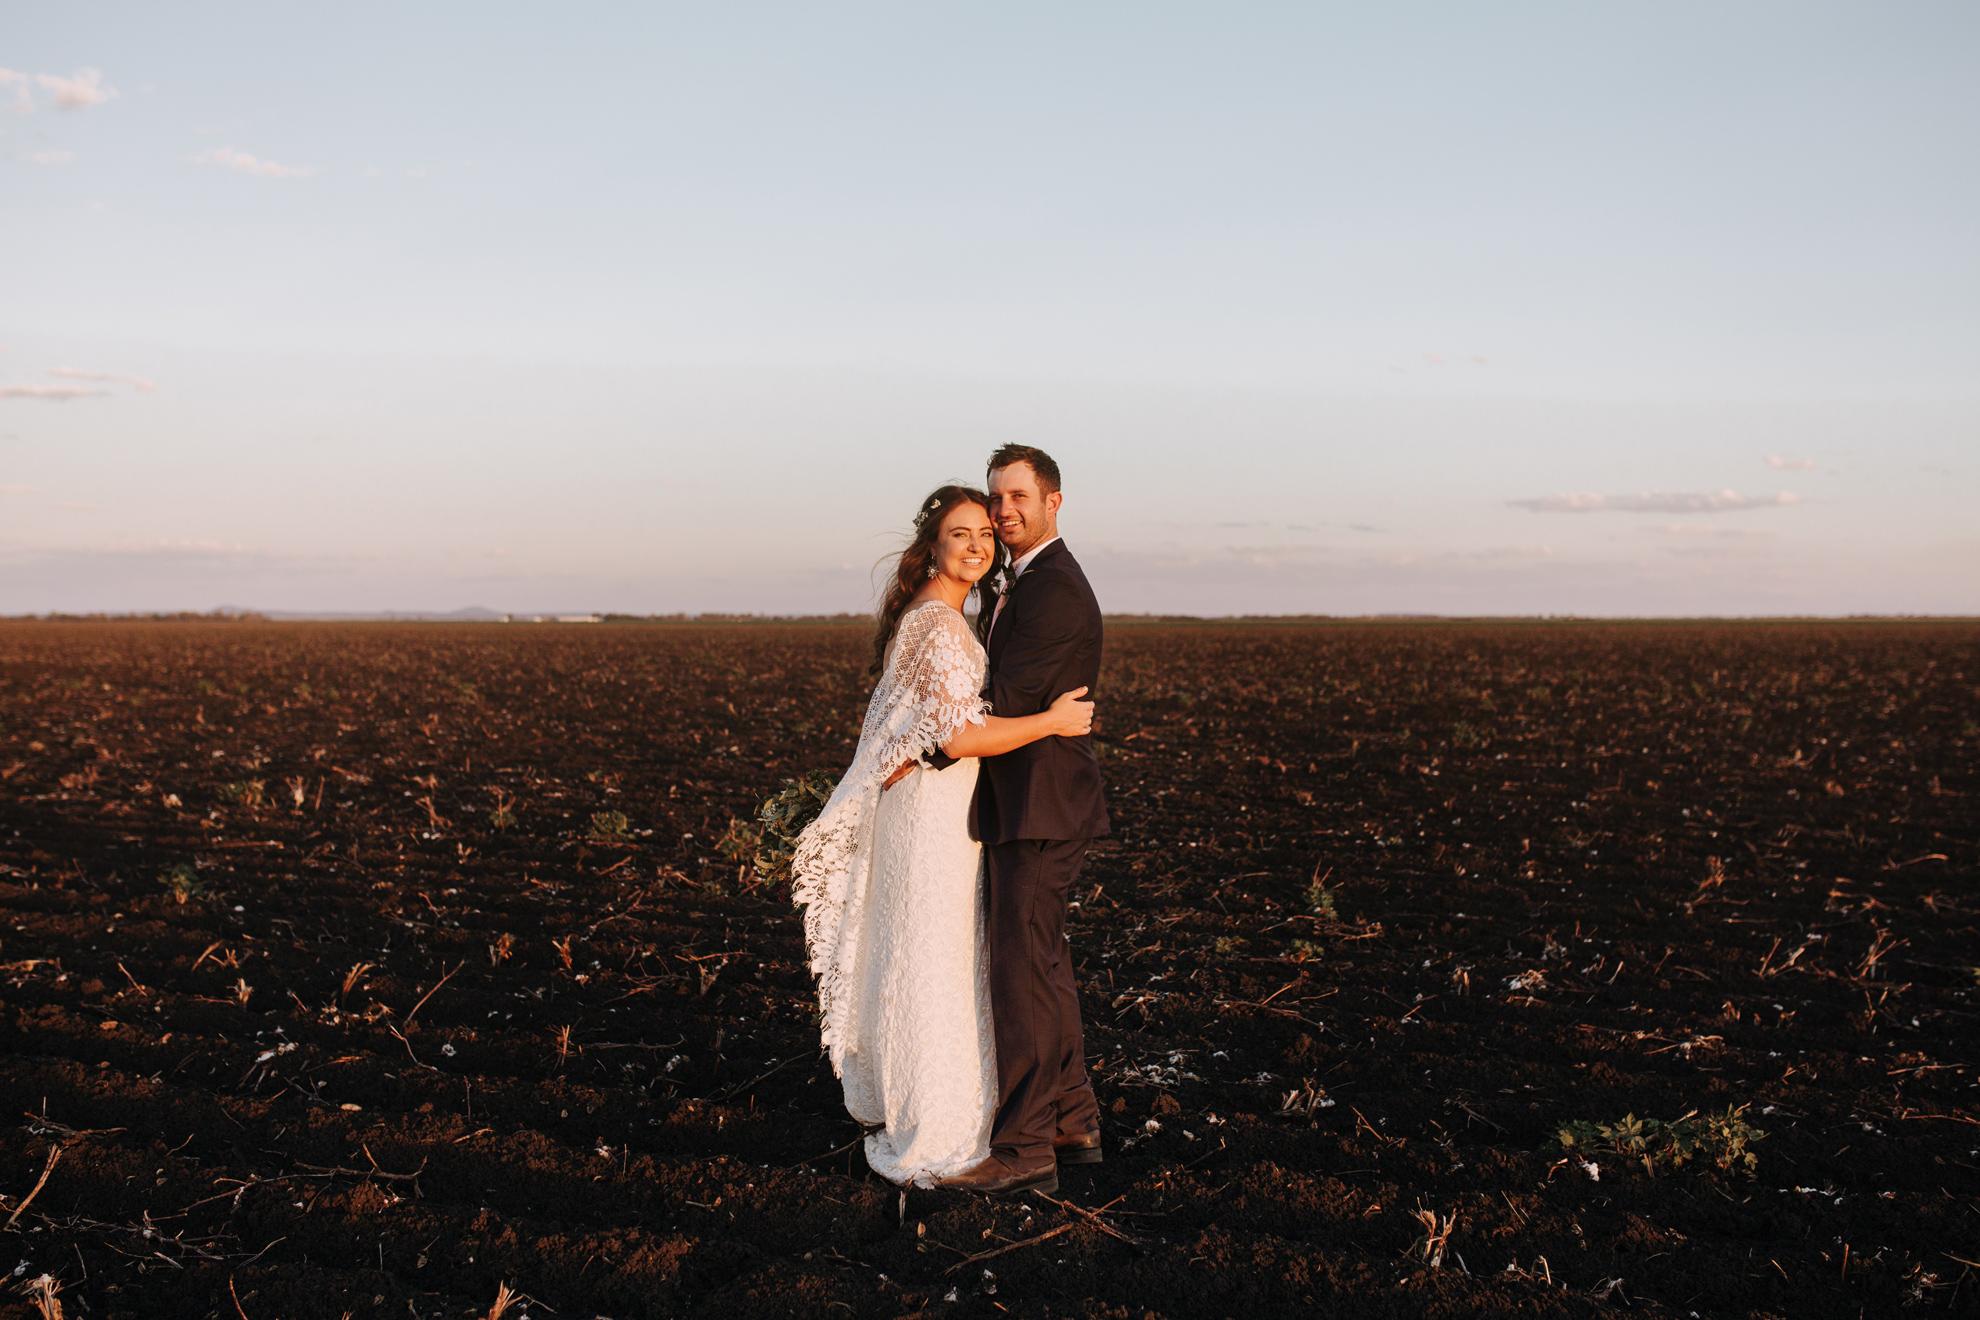 064-Jason_Jessie_Dalby_Country_Wedding.jpg